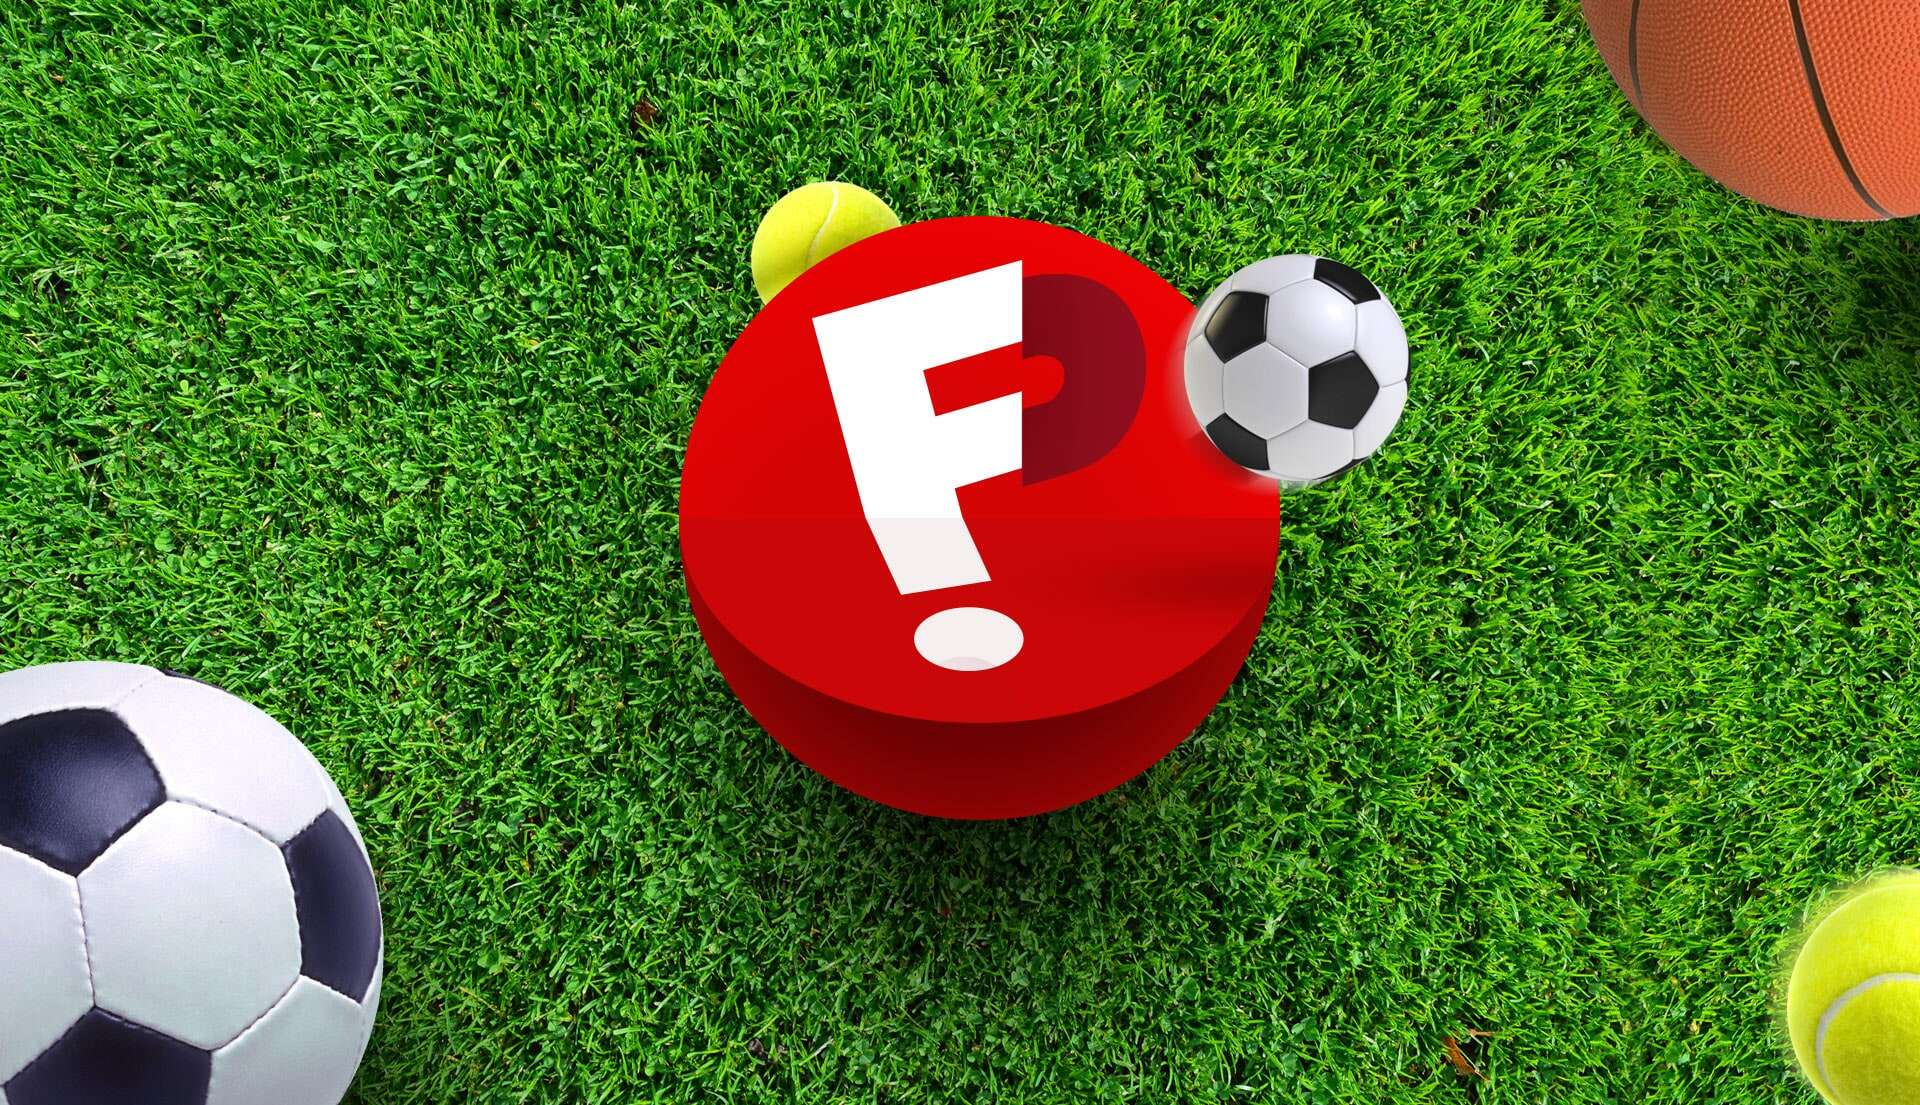 Fun Park футбол, теннис, биллиард, атракционы, игры